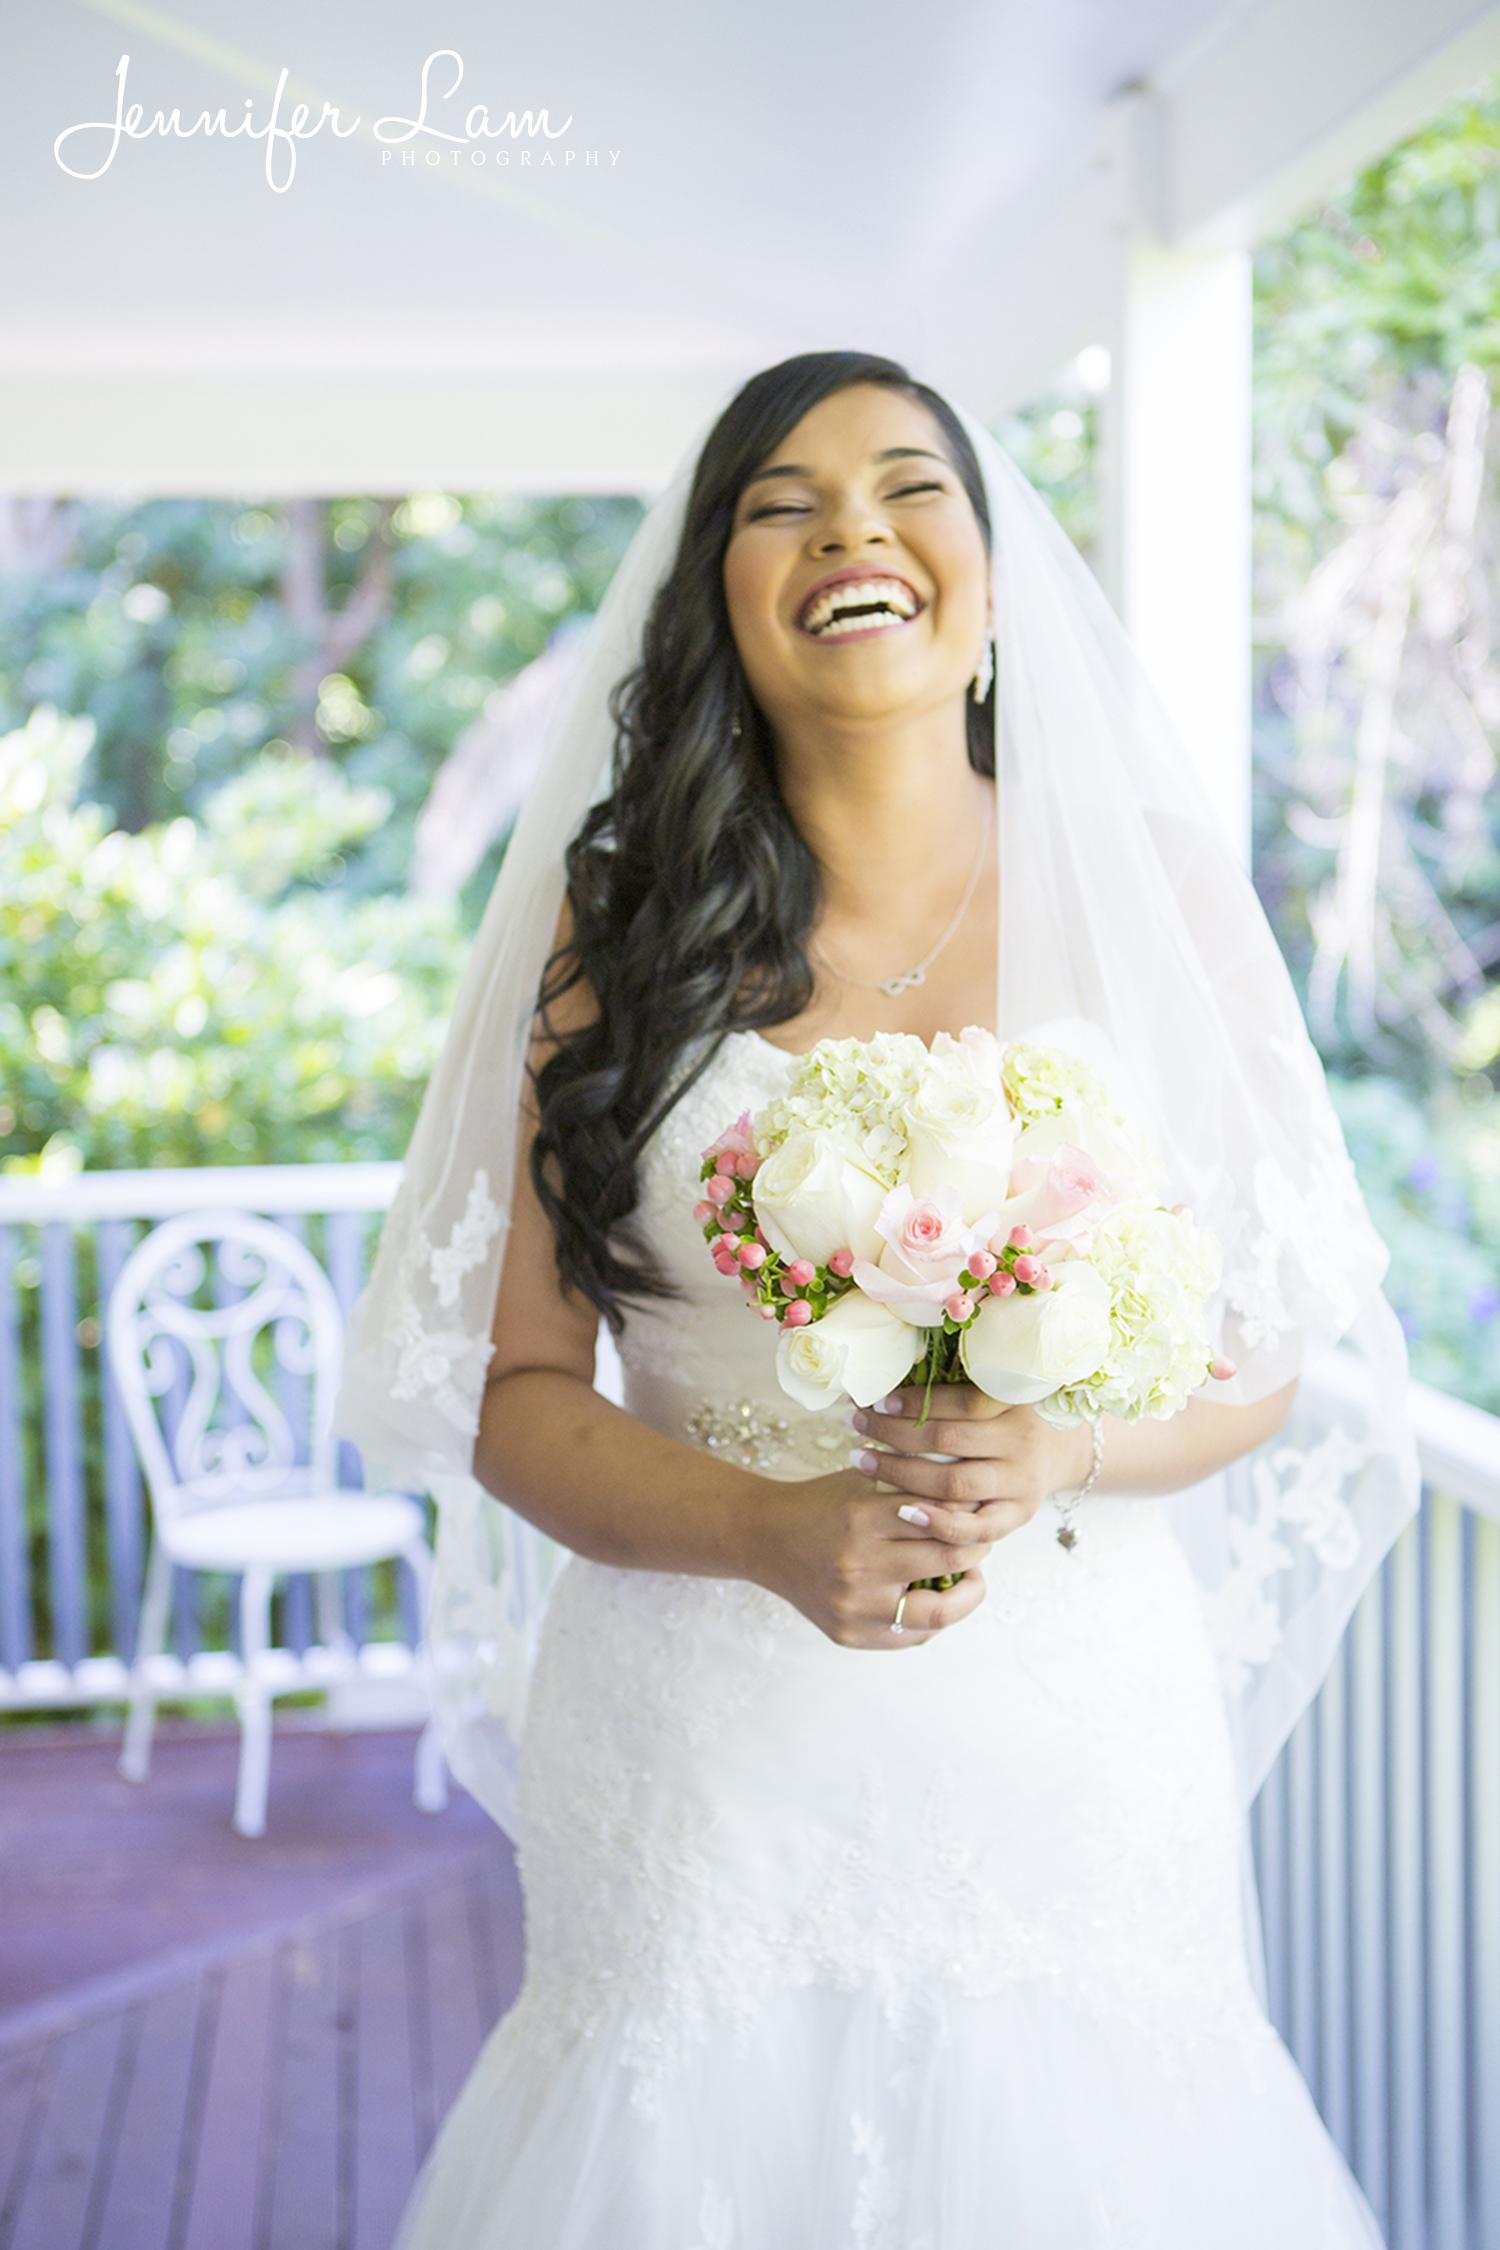 Sydney Wedding Photographer - Jennifer Lam Photography - www.jenniferlamphotography (18).jpg